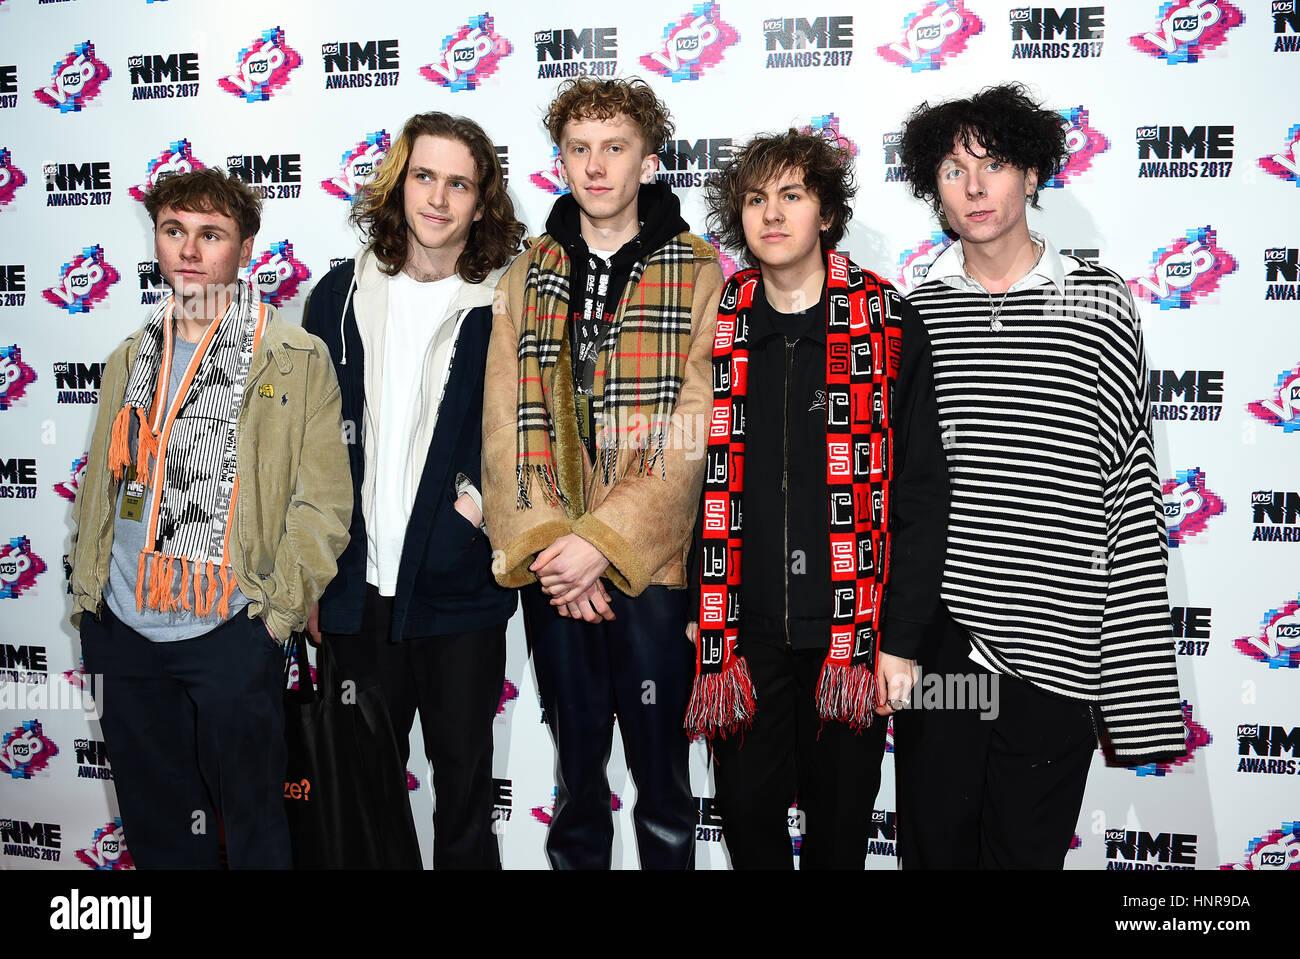 Boy band members